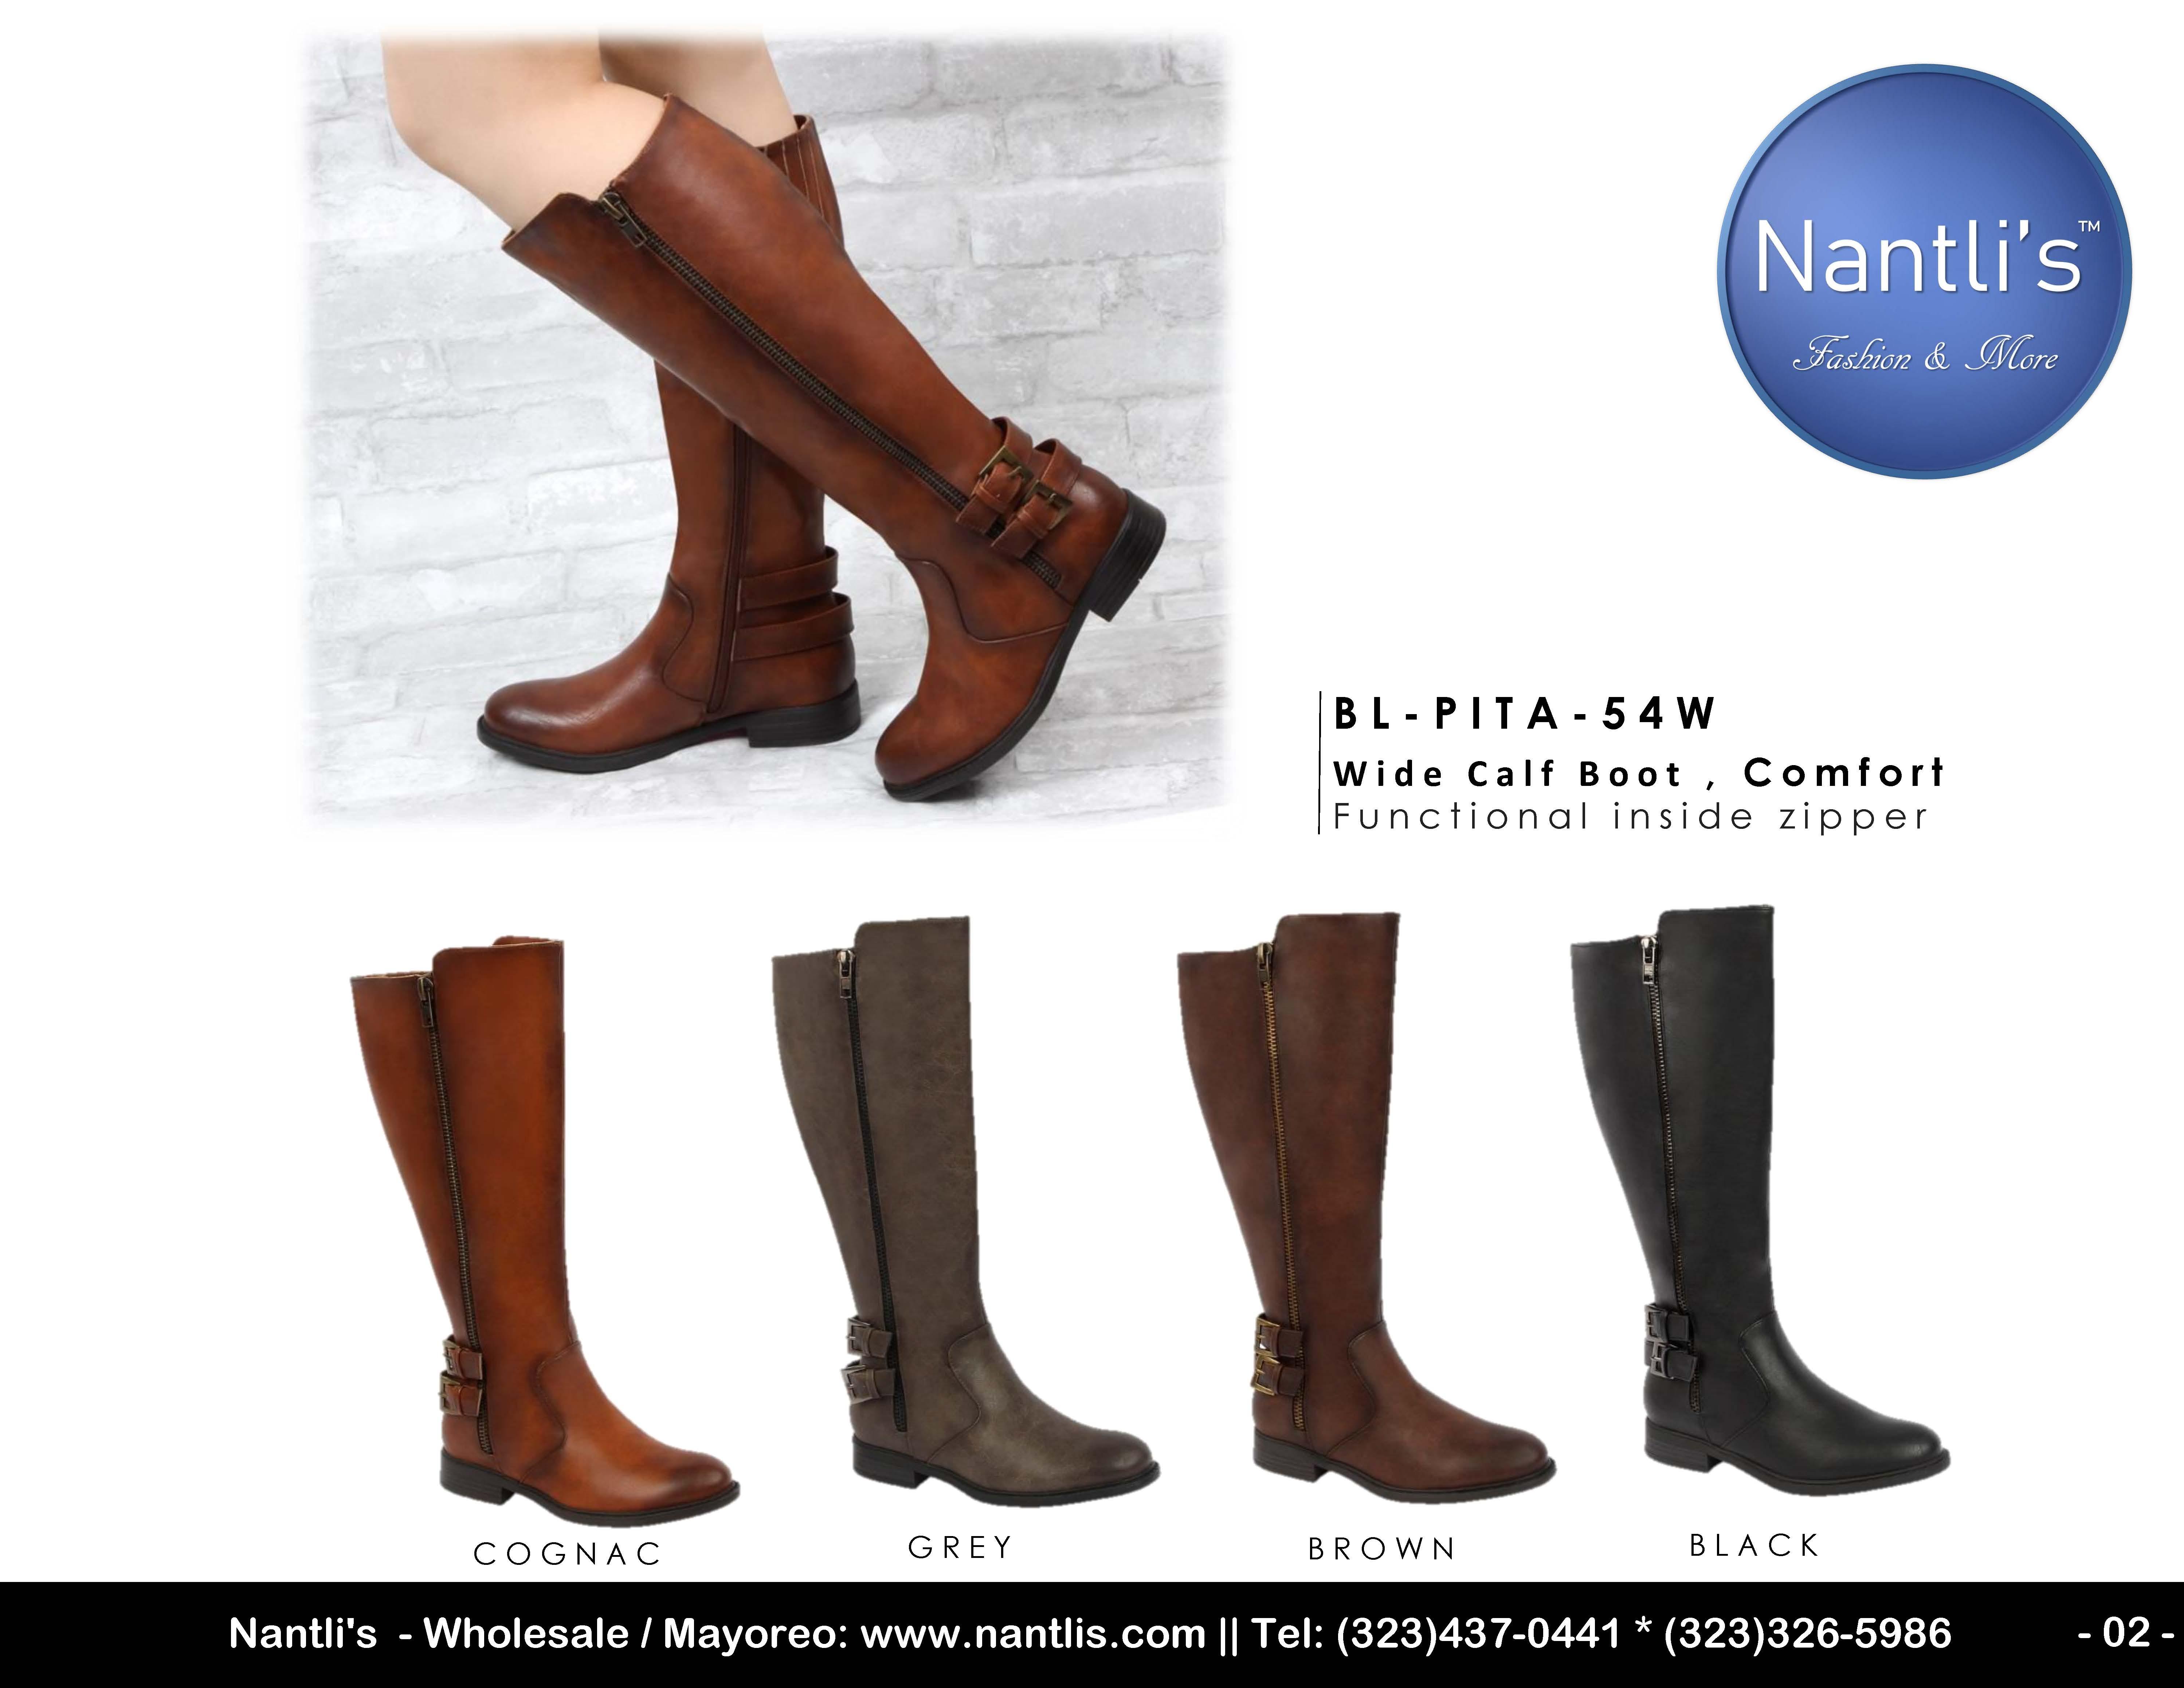 Nantlis Vol BL39 Botas de Mujer mayoreo Catalogo Wholesale womens Boots_Page_02